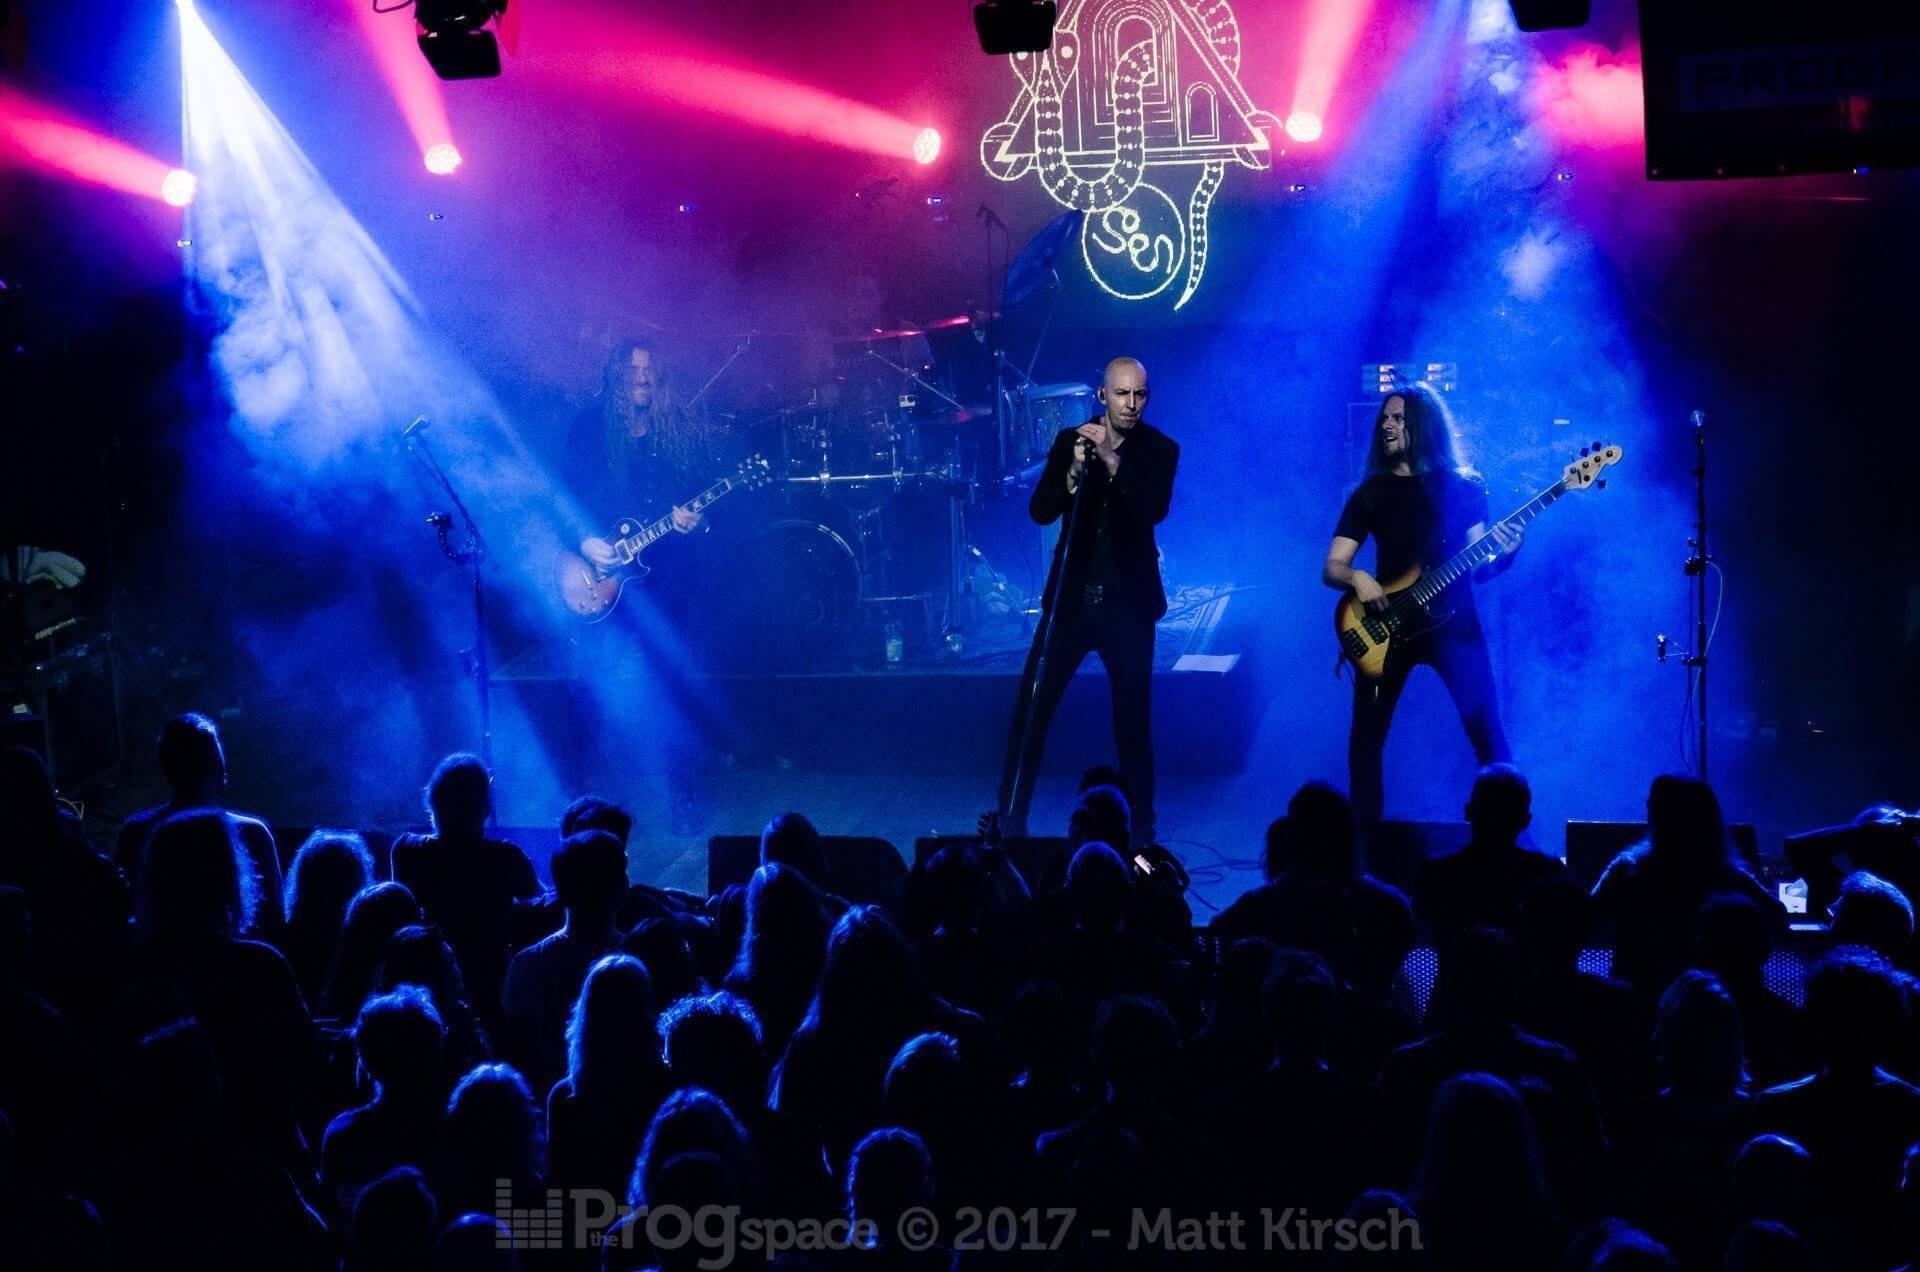 09-Soen-ProgpowerEurope2017-24